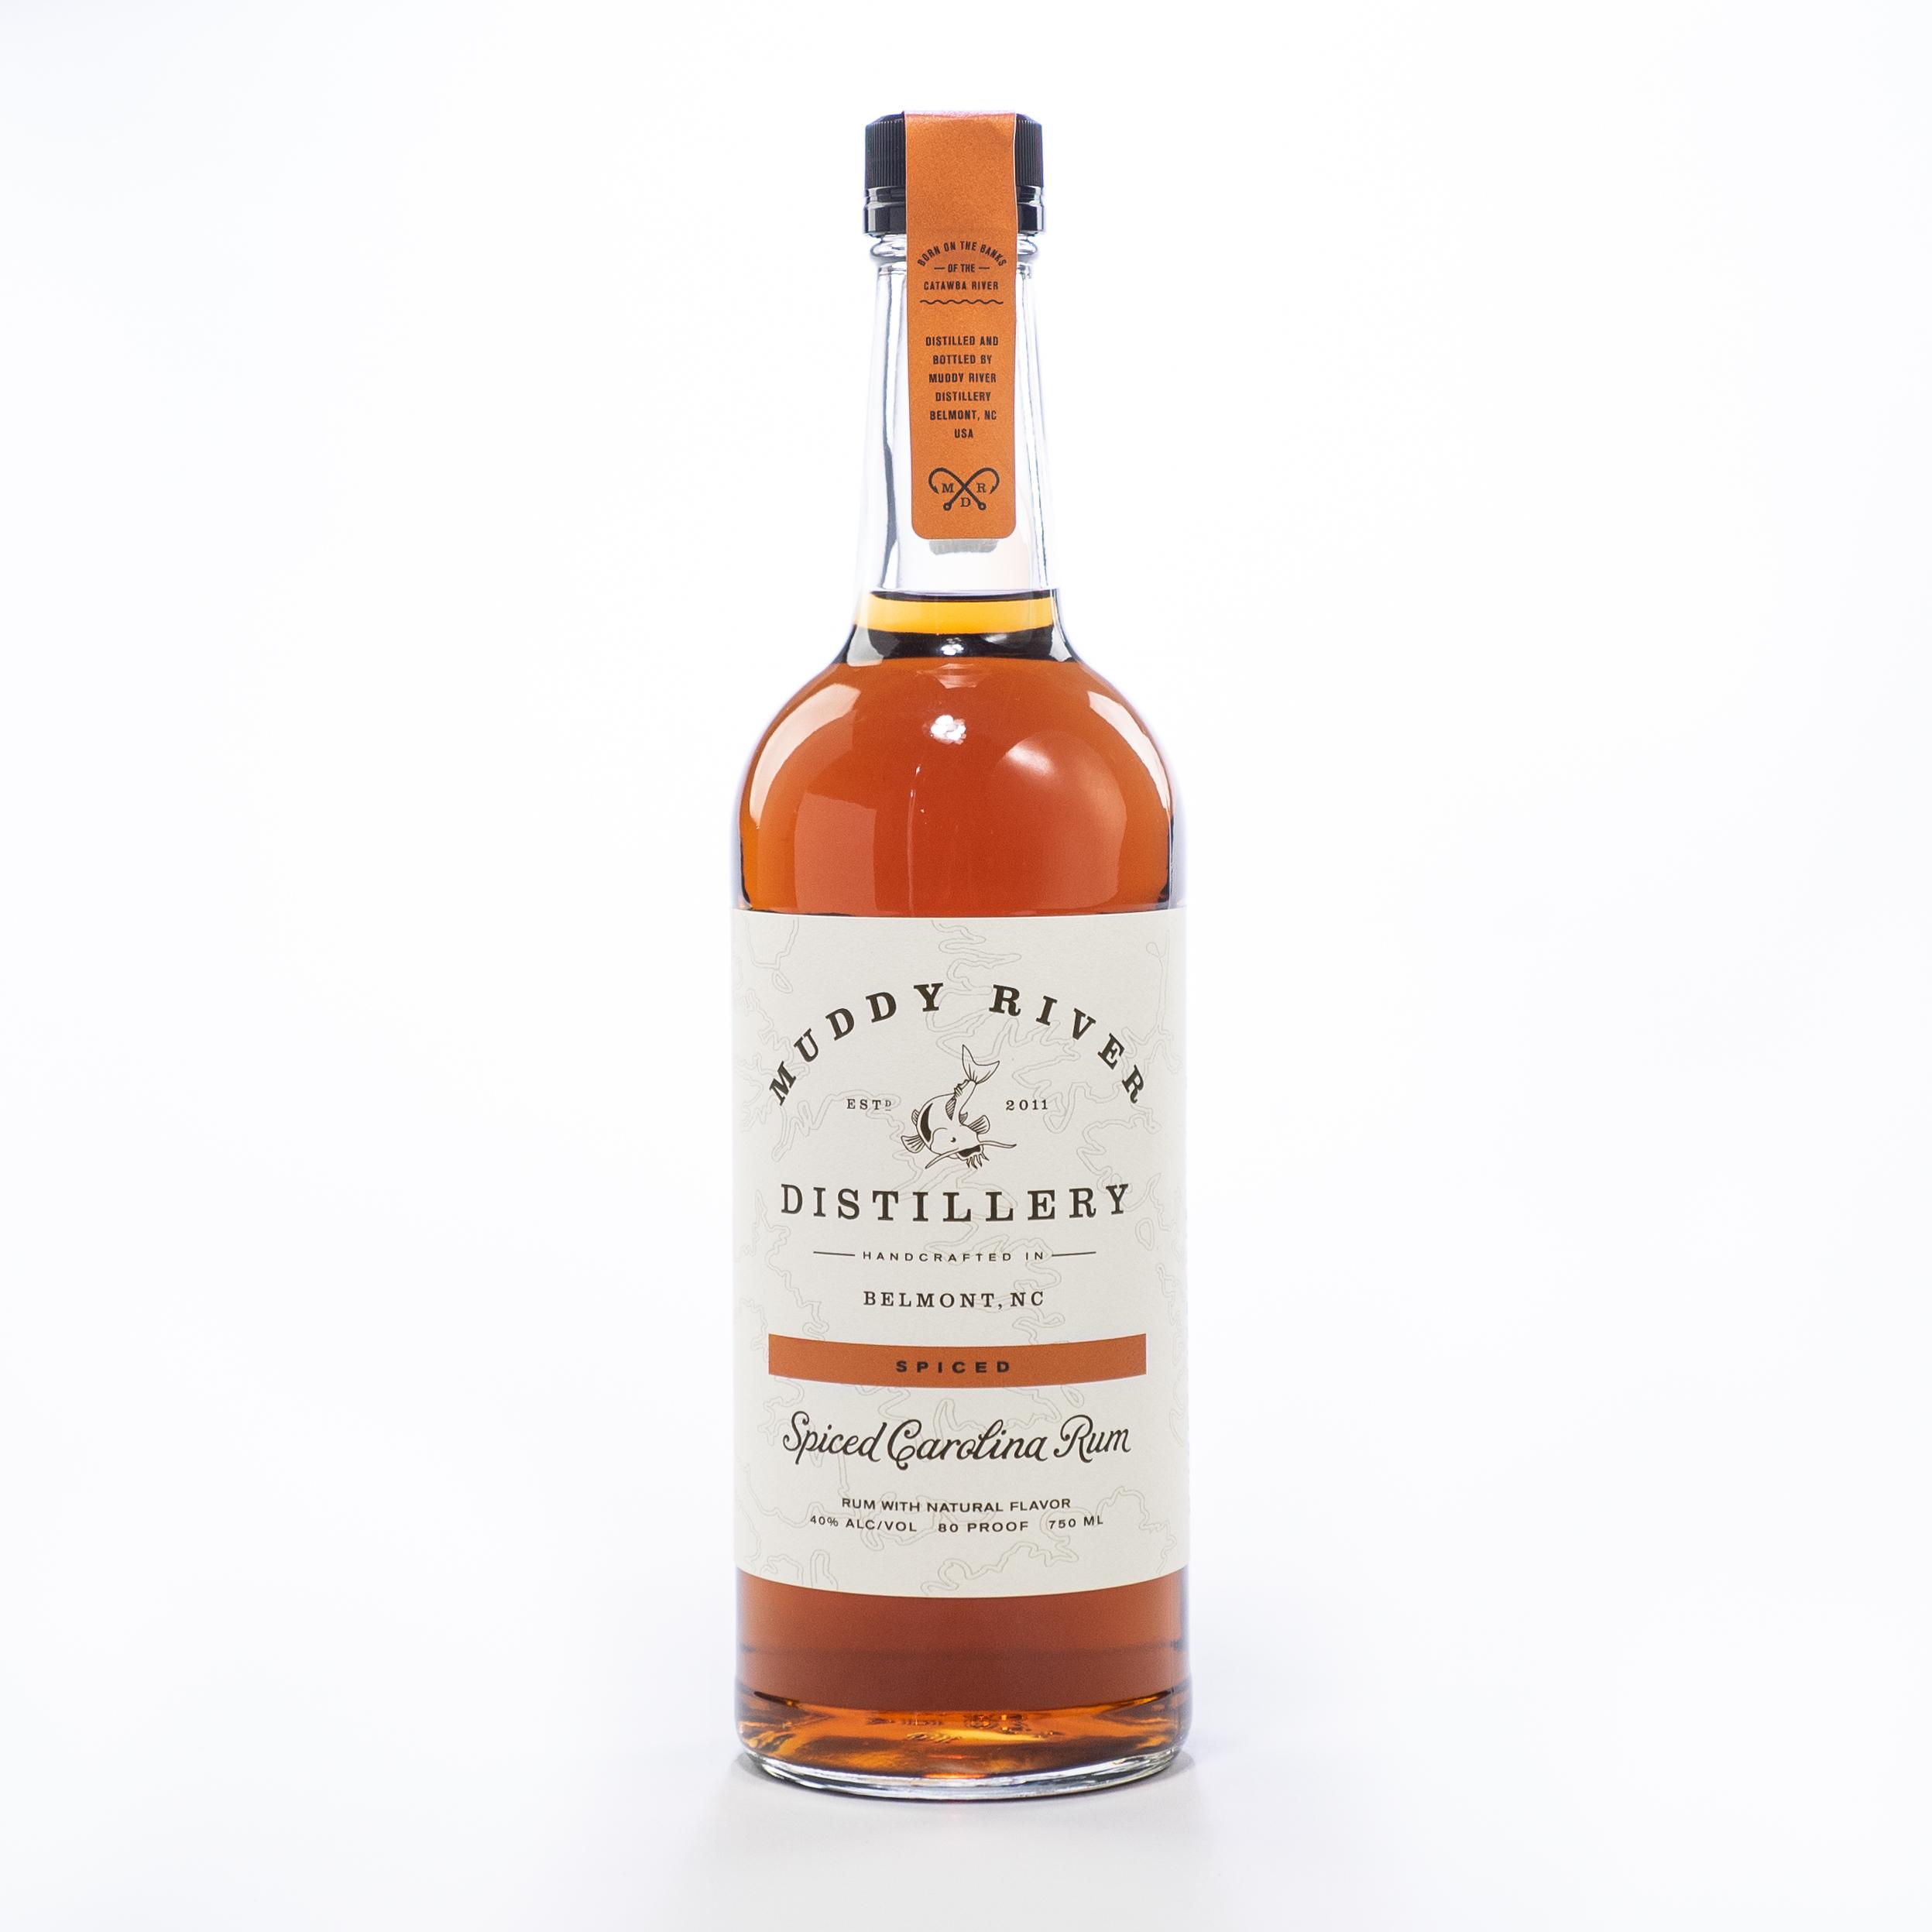 Muddy River Spiced Carolina Rum